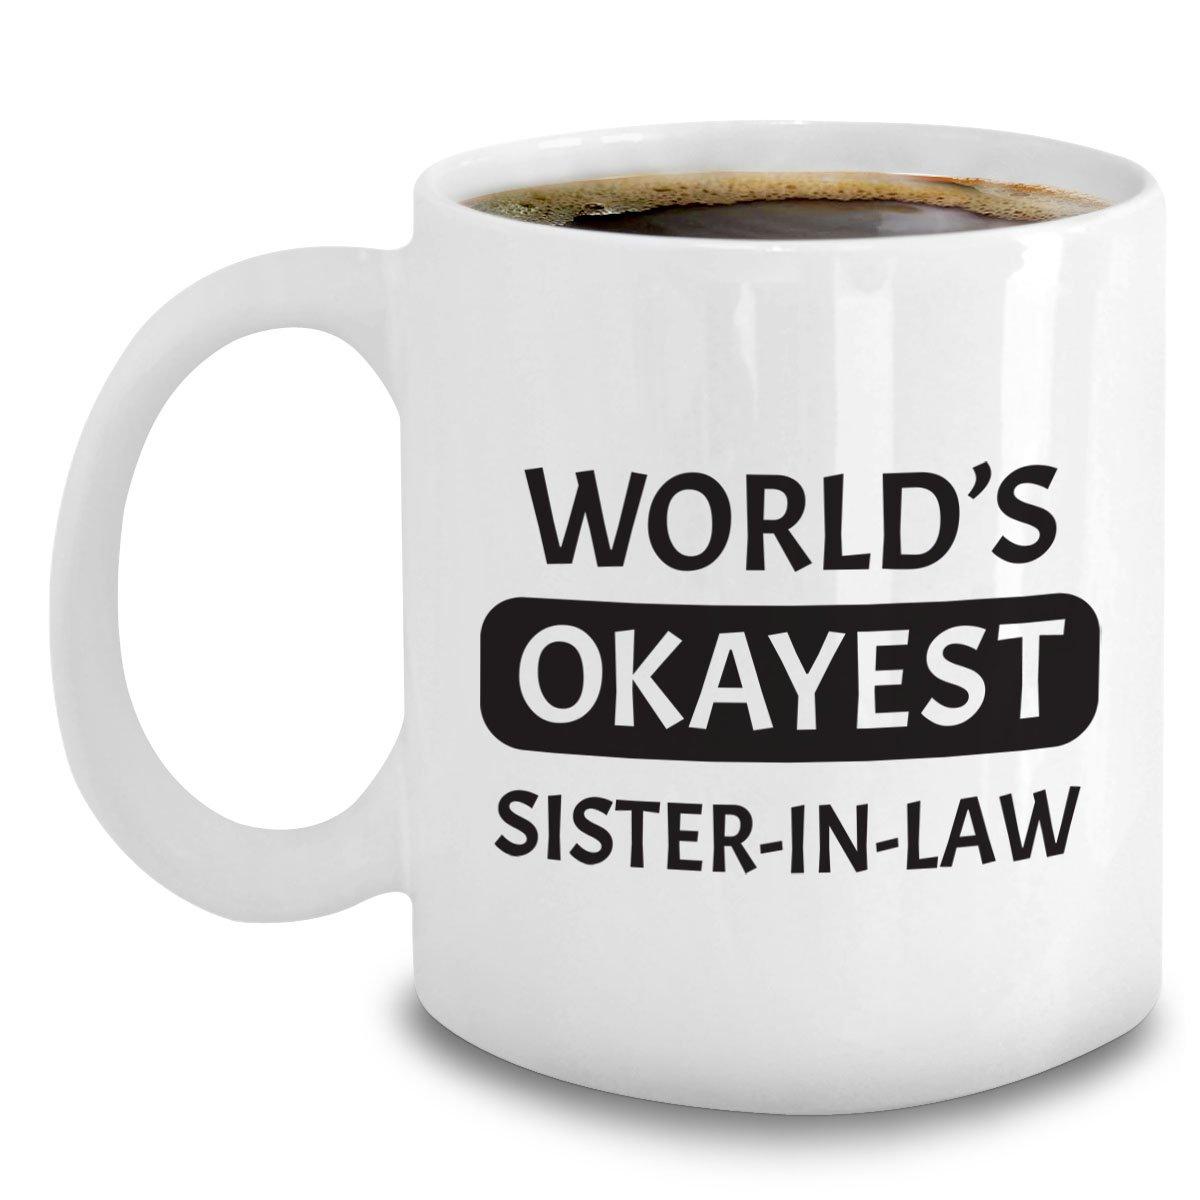 Amazon Okayest Sister In Law Mug